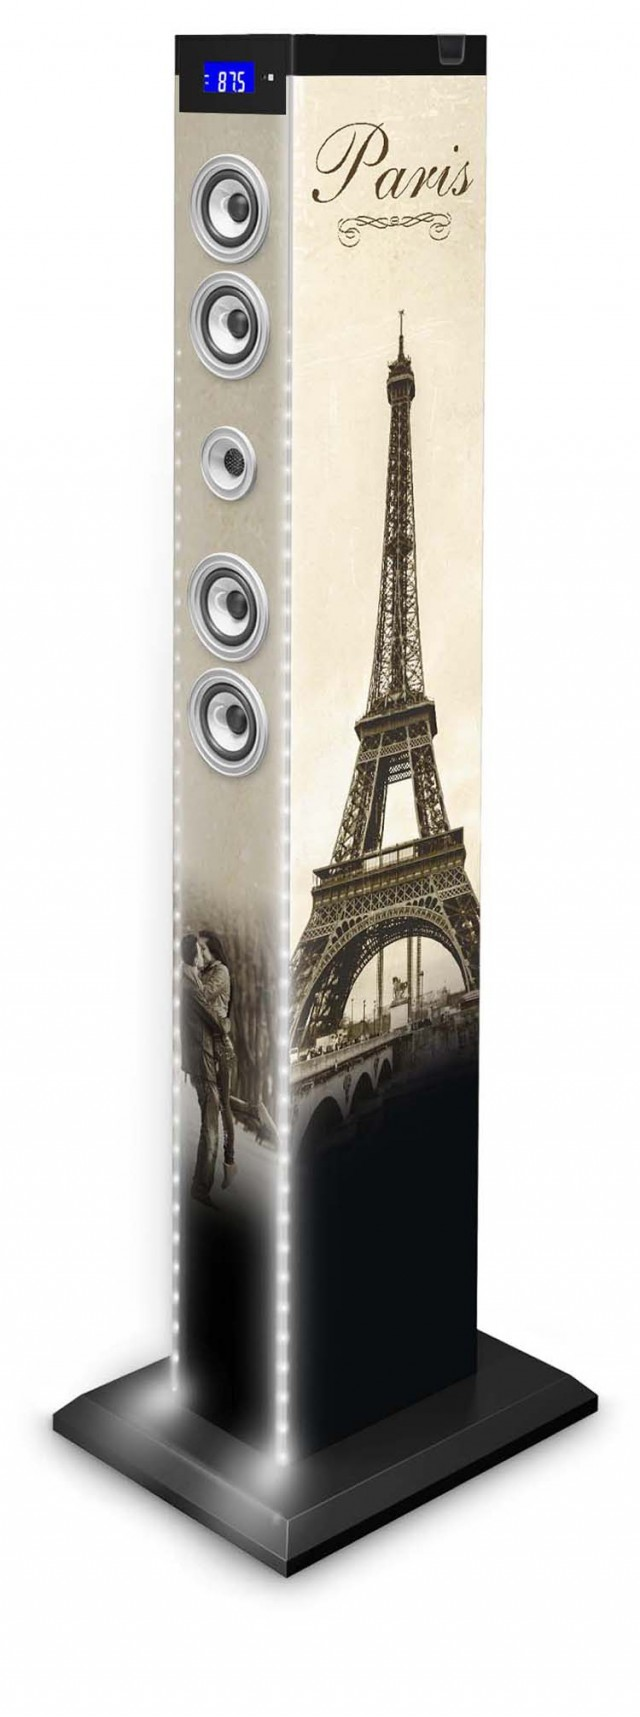 Multimedia Tower Light Paris - Packshot